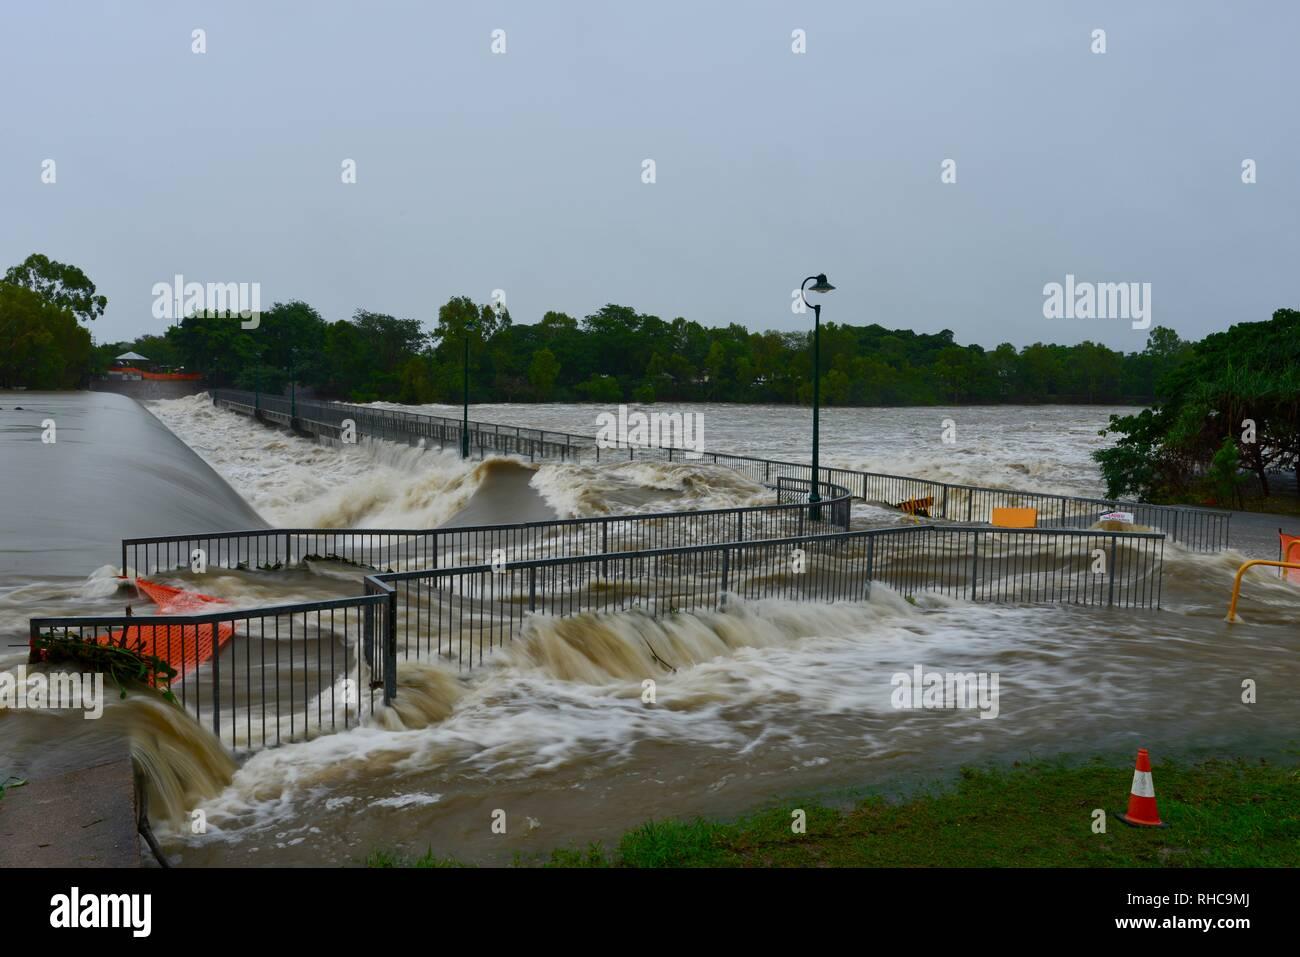 River Flood Debris Bridge Stock Photos & River Flood Debris